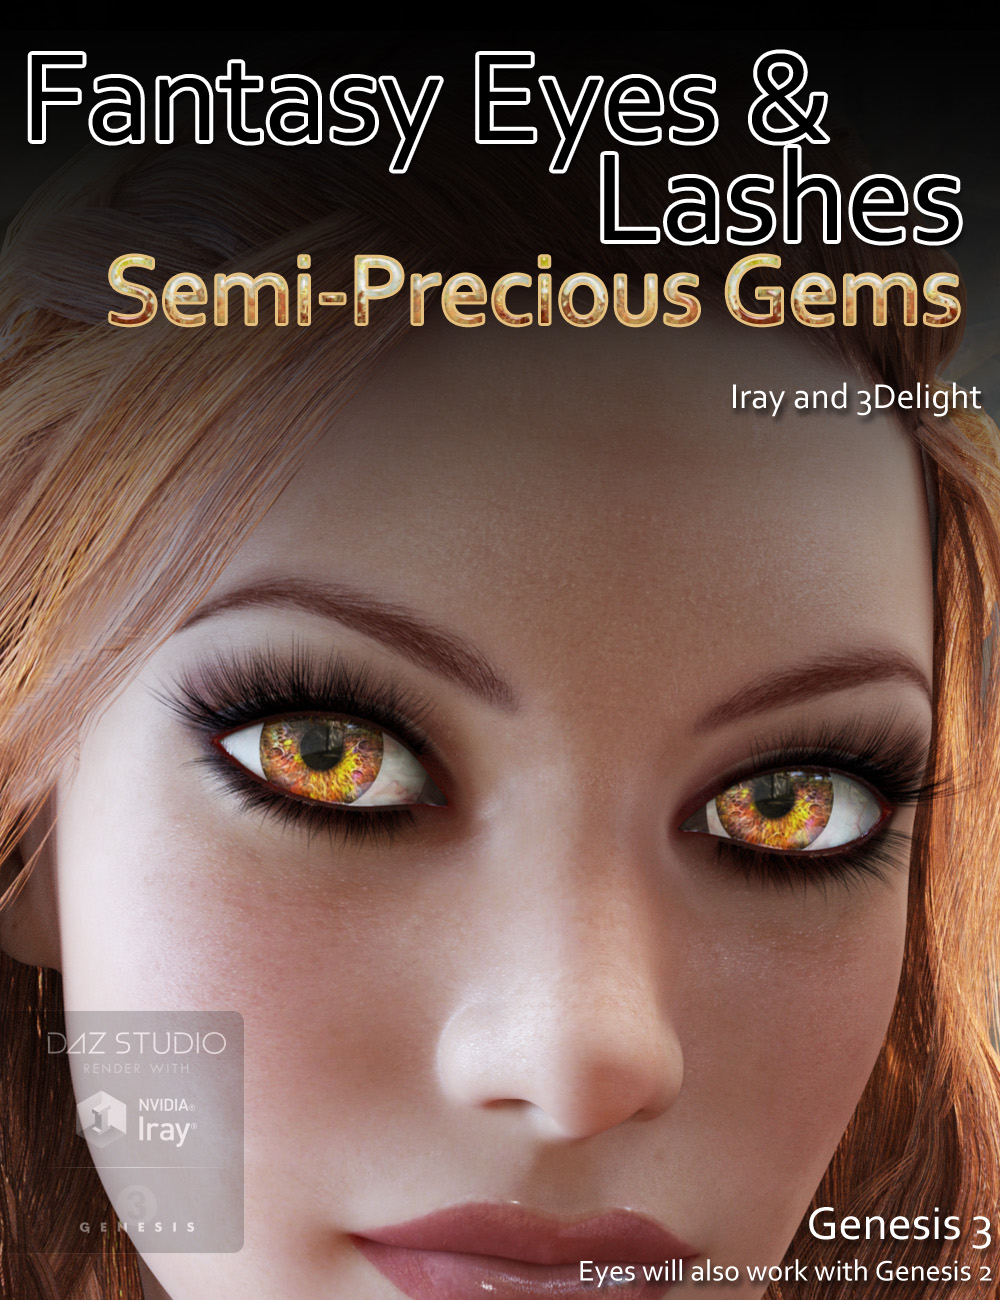 Fantasy Eyes - Semi Precious Gems and Lashes by: DraagonStorm, 3D Models by Daz 3D